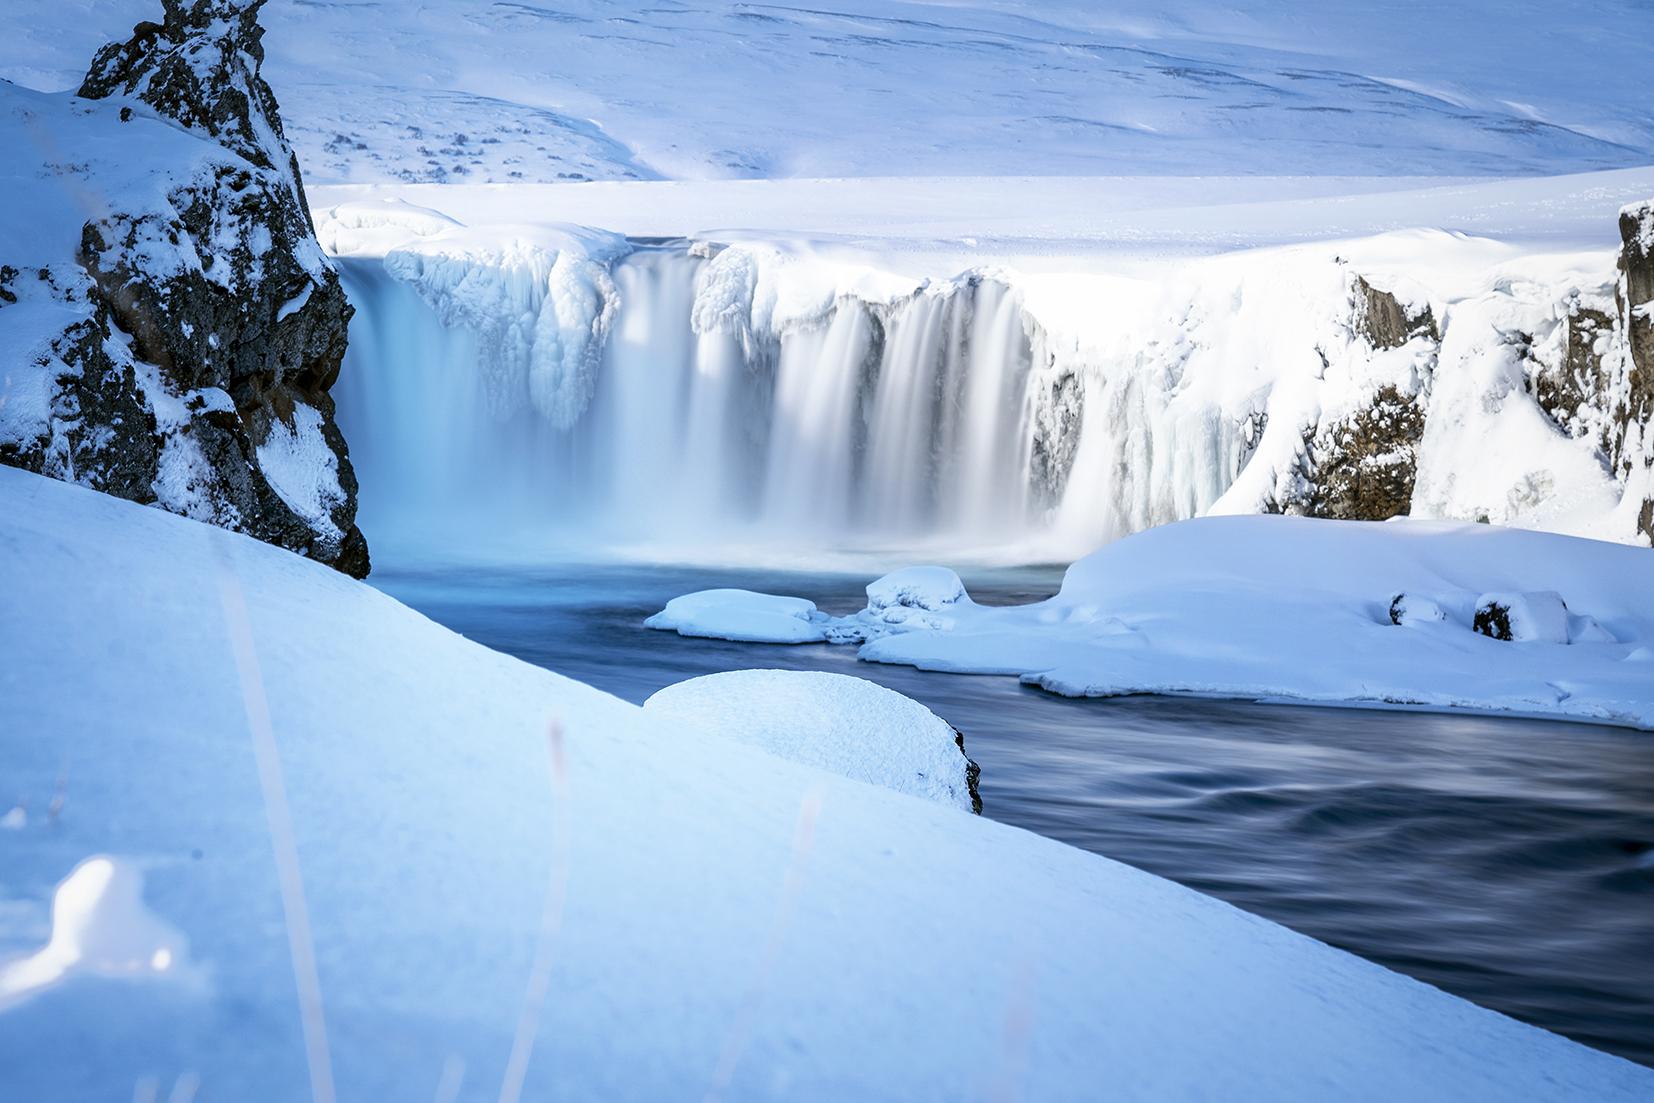 Goðafoss Islande du Nord cascade neige glace eau bleu et blanc